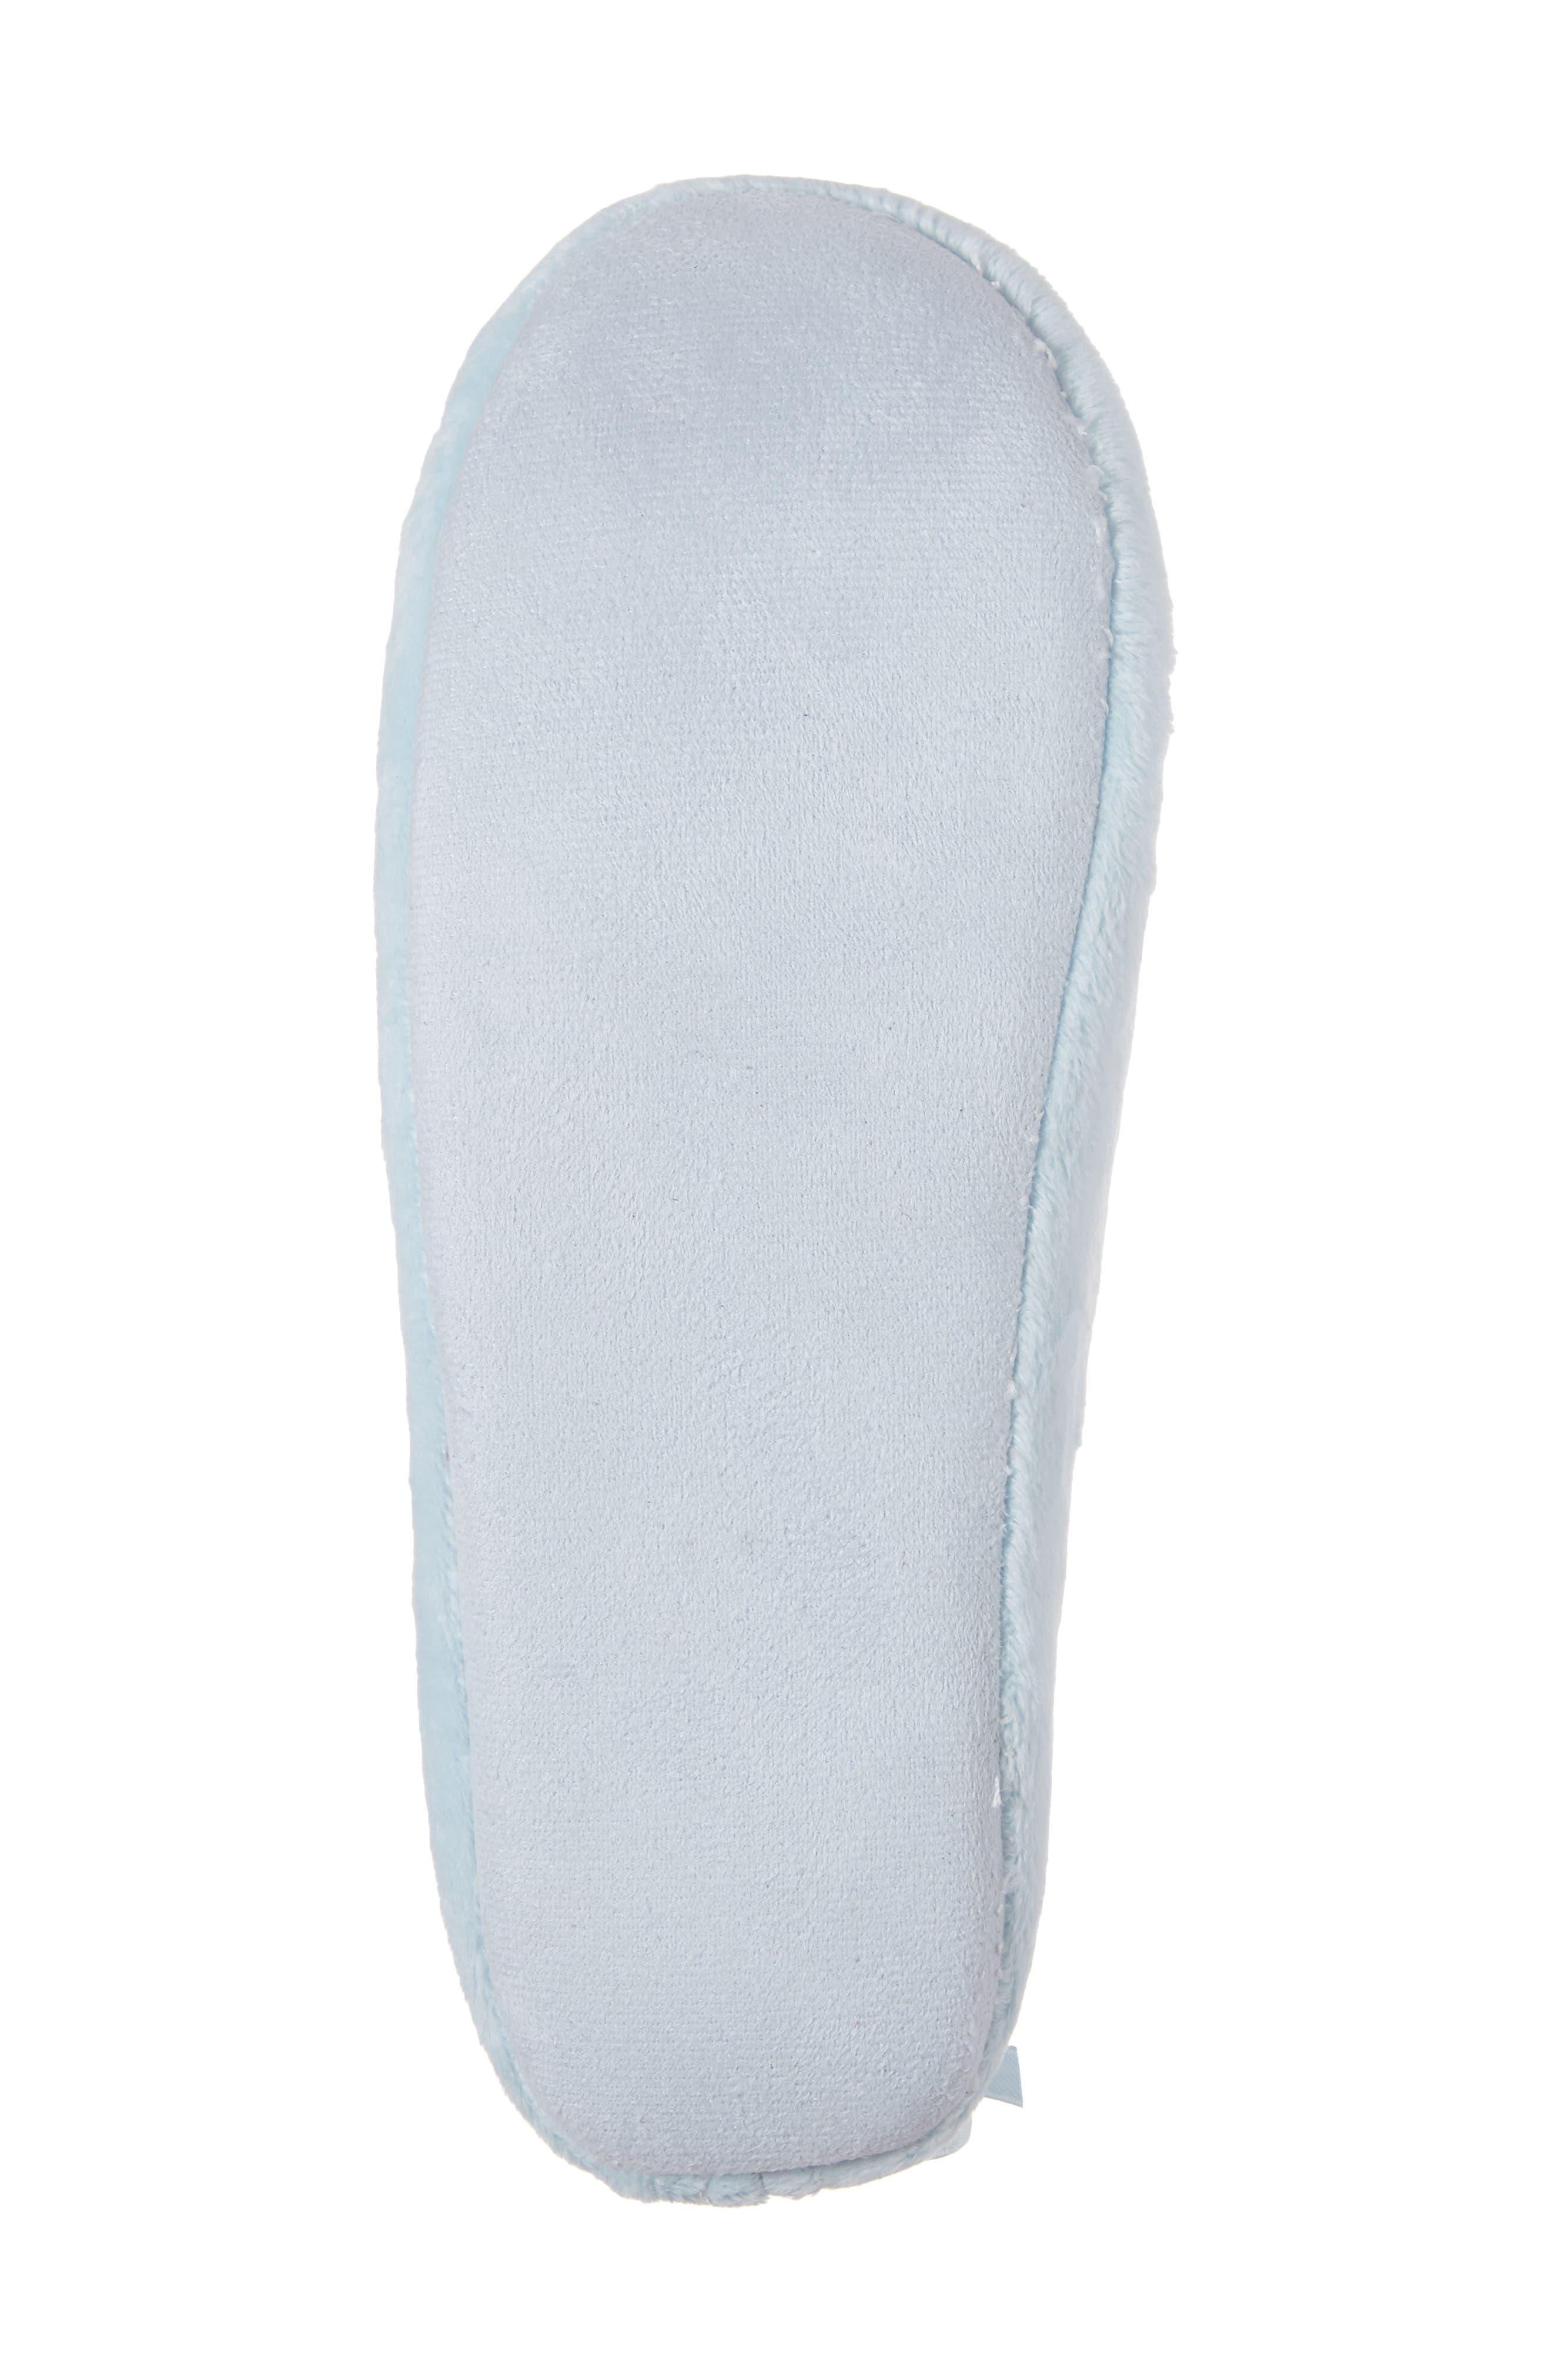 Plush Pompom Slipper,                             Alternate thumbnail 6, color,                             Blue